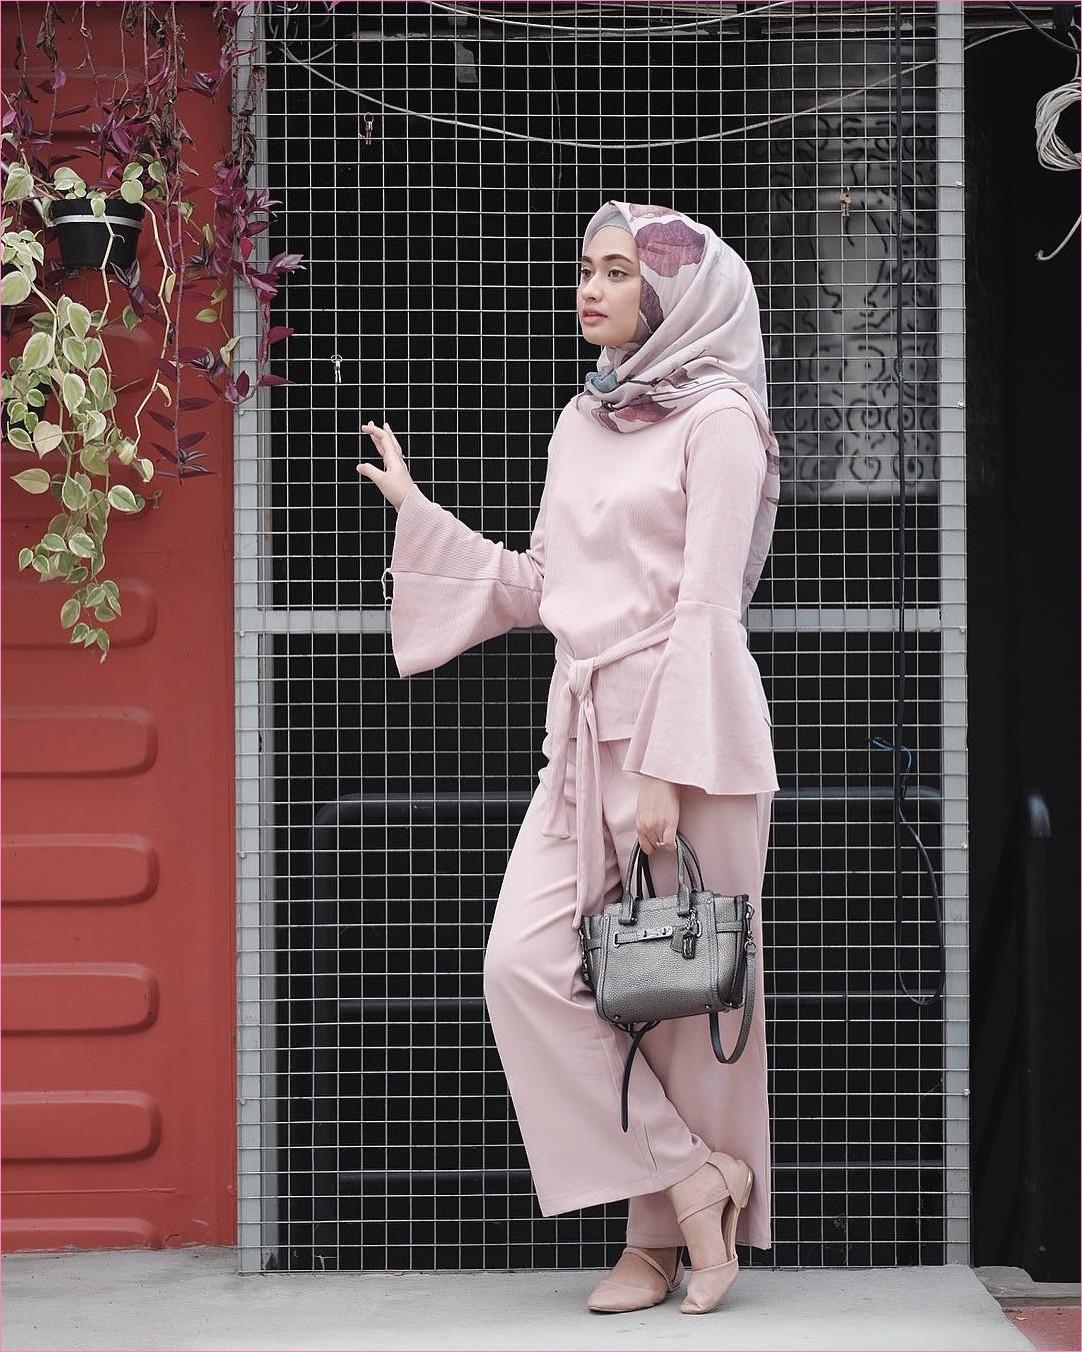 Outfit Baju Hijab Casual Untuk Ke Kantor Ala Selebgam 2018 slingbags abu tua hitam ciput rajut abu muda top blouse pita lengan terompet lebar pallazo cullotes ungu muda pastel square hijab ungu tua loafers and slip ons flatshoes gaya casual kain sutra rayon ootd outfit 2018 selebgram